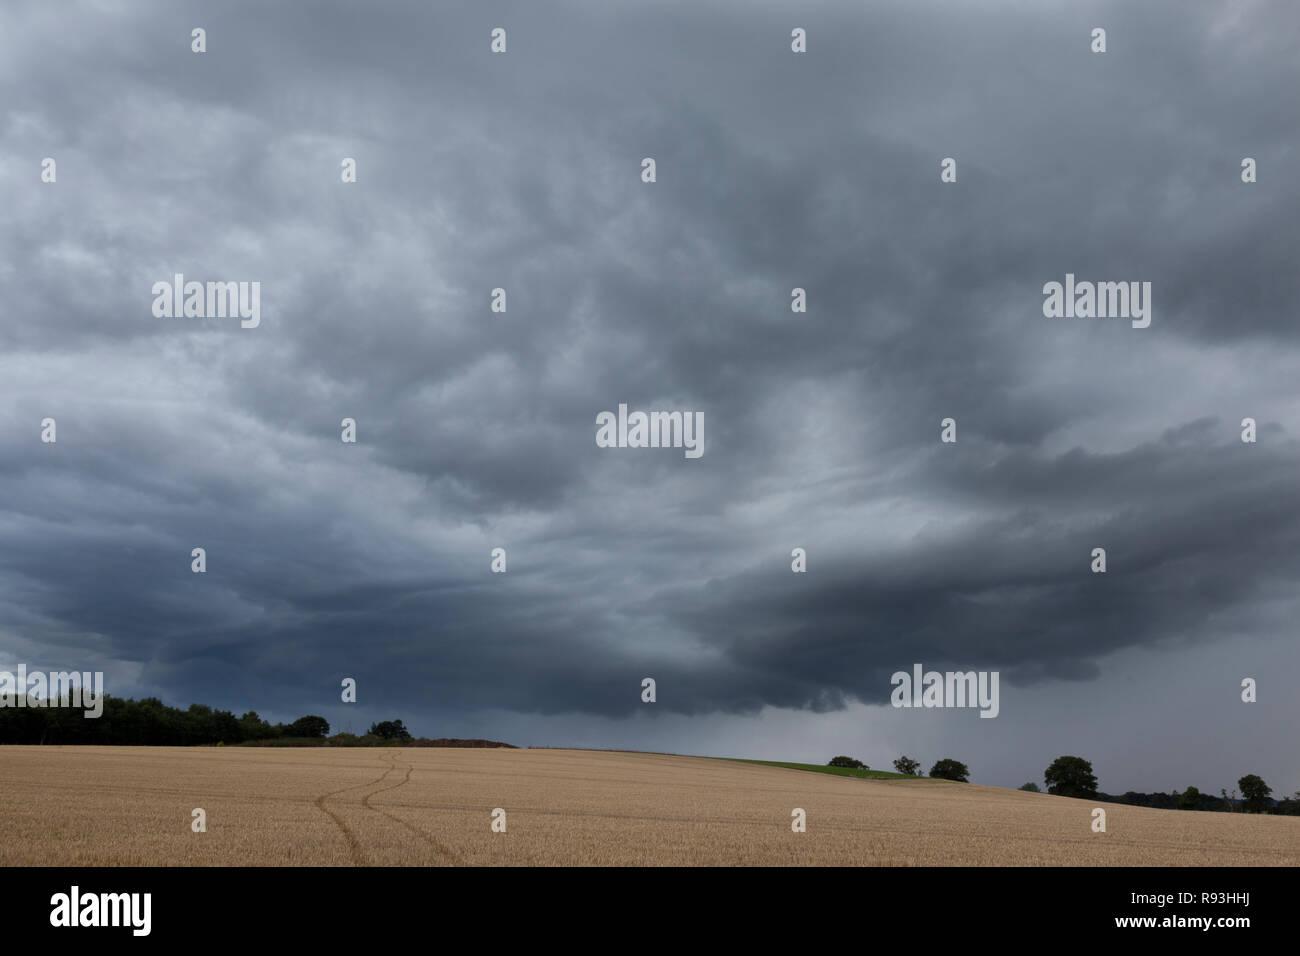 Acercarse a una tormenta con nubes amenazando lluvia Imagen De Stock